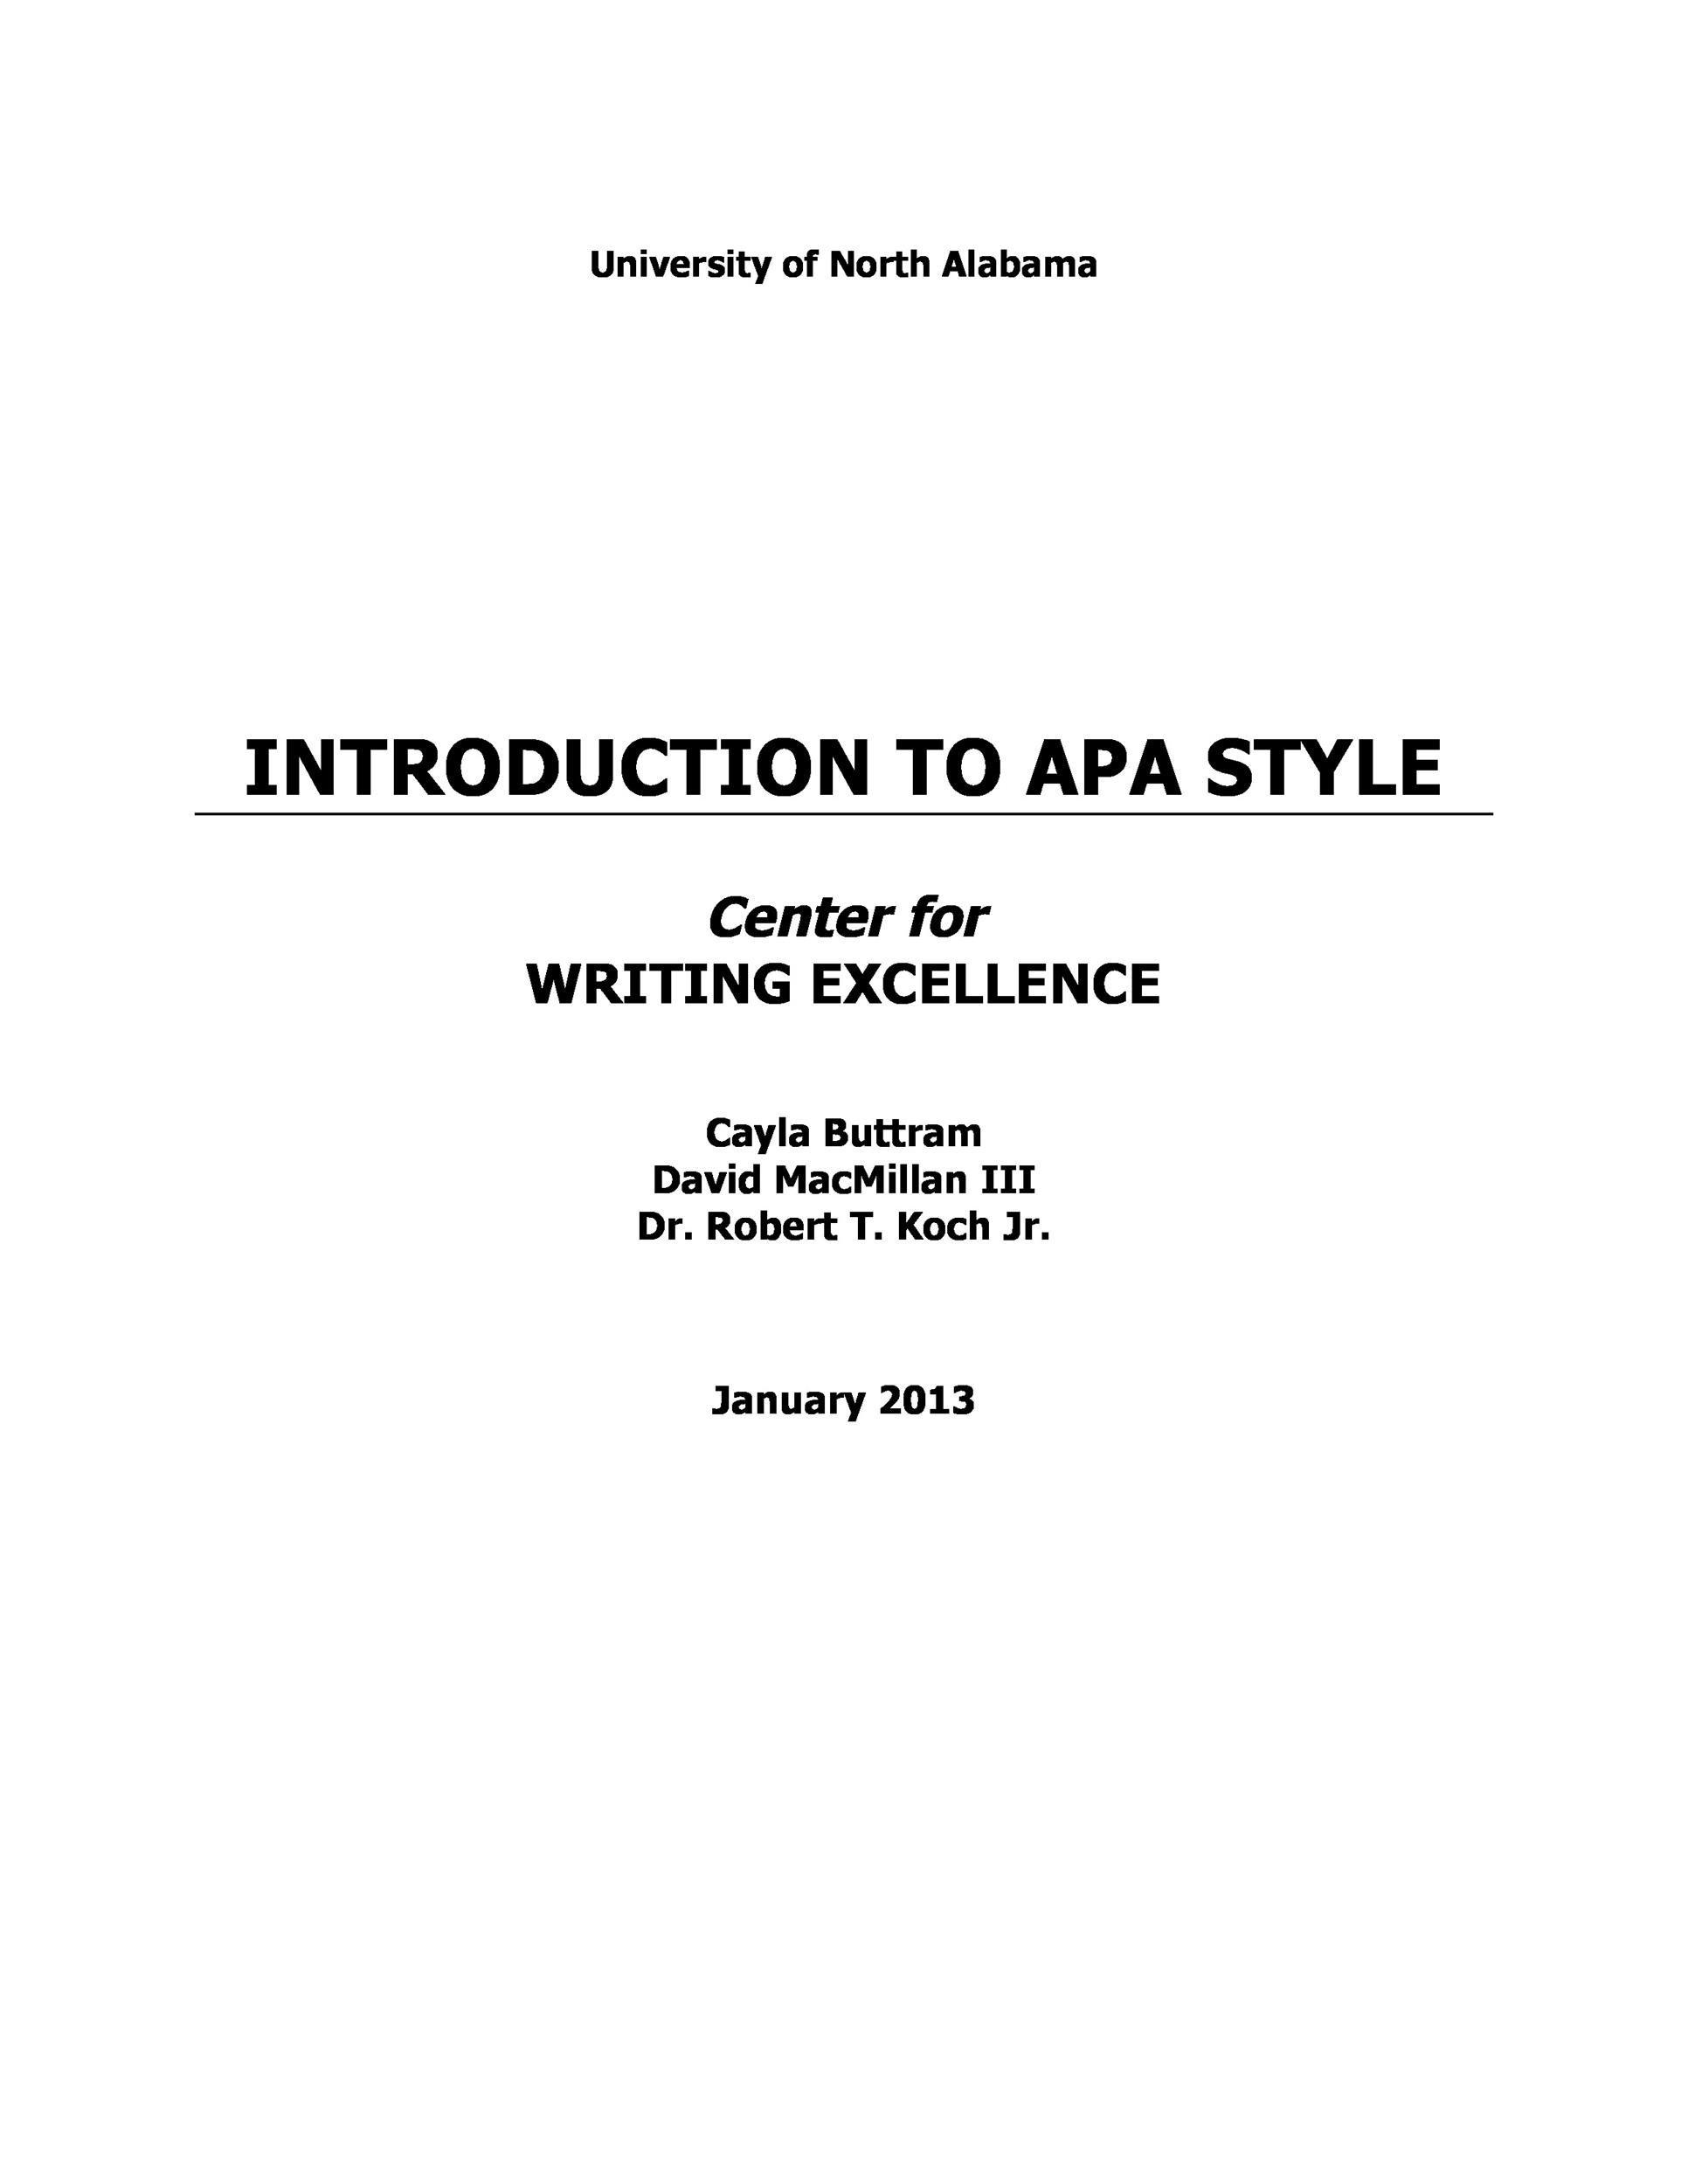 Apa intro page apa essay example